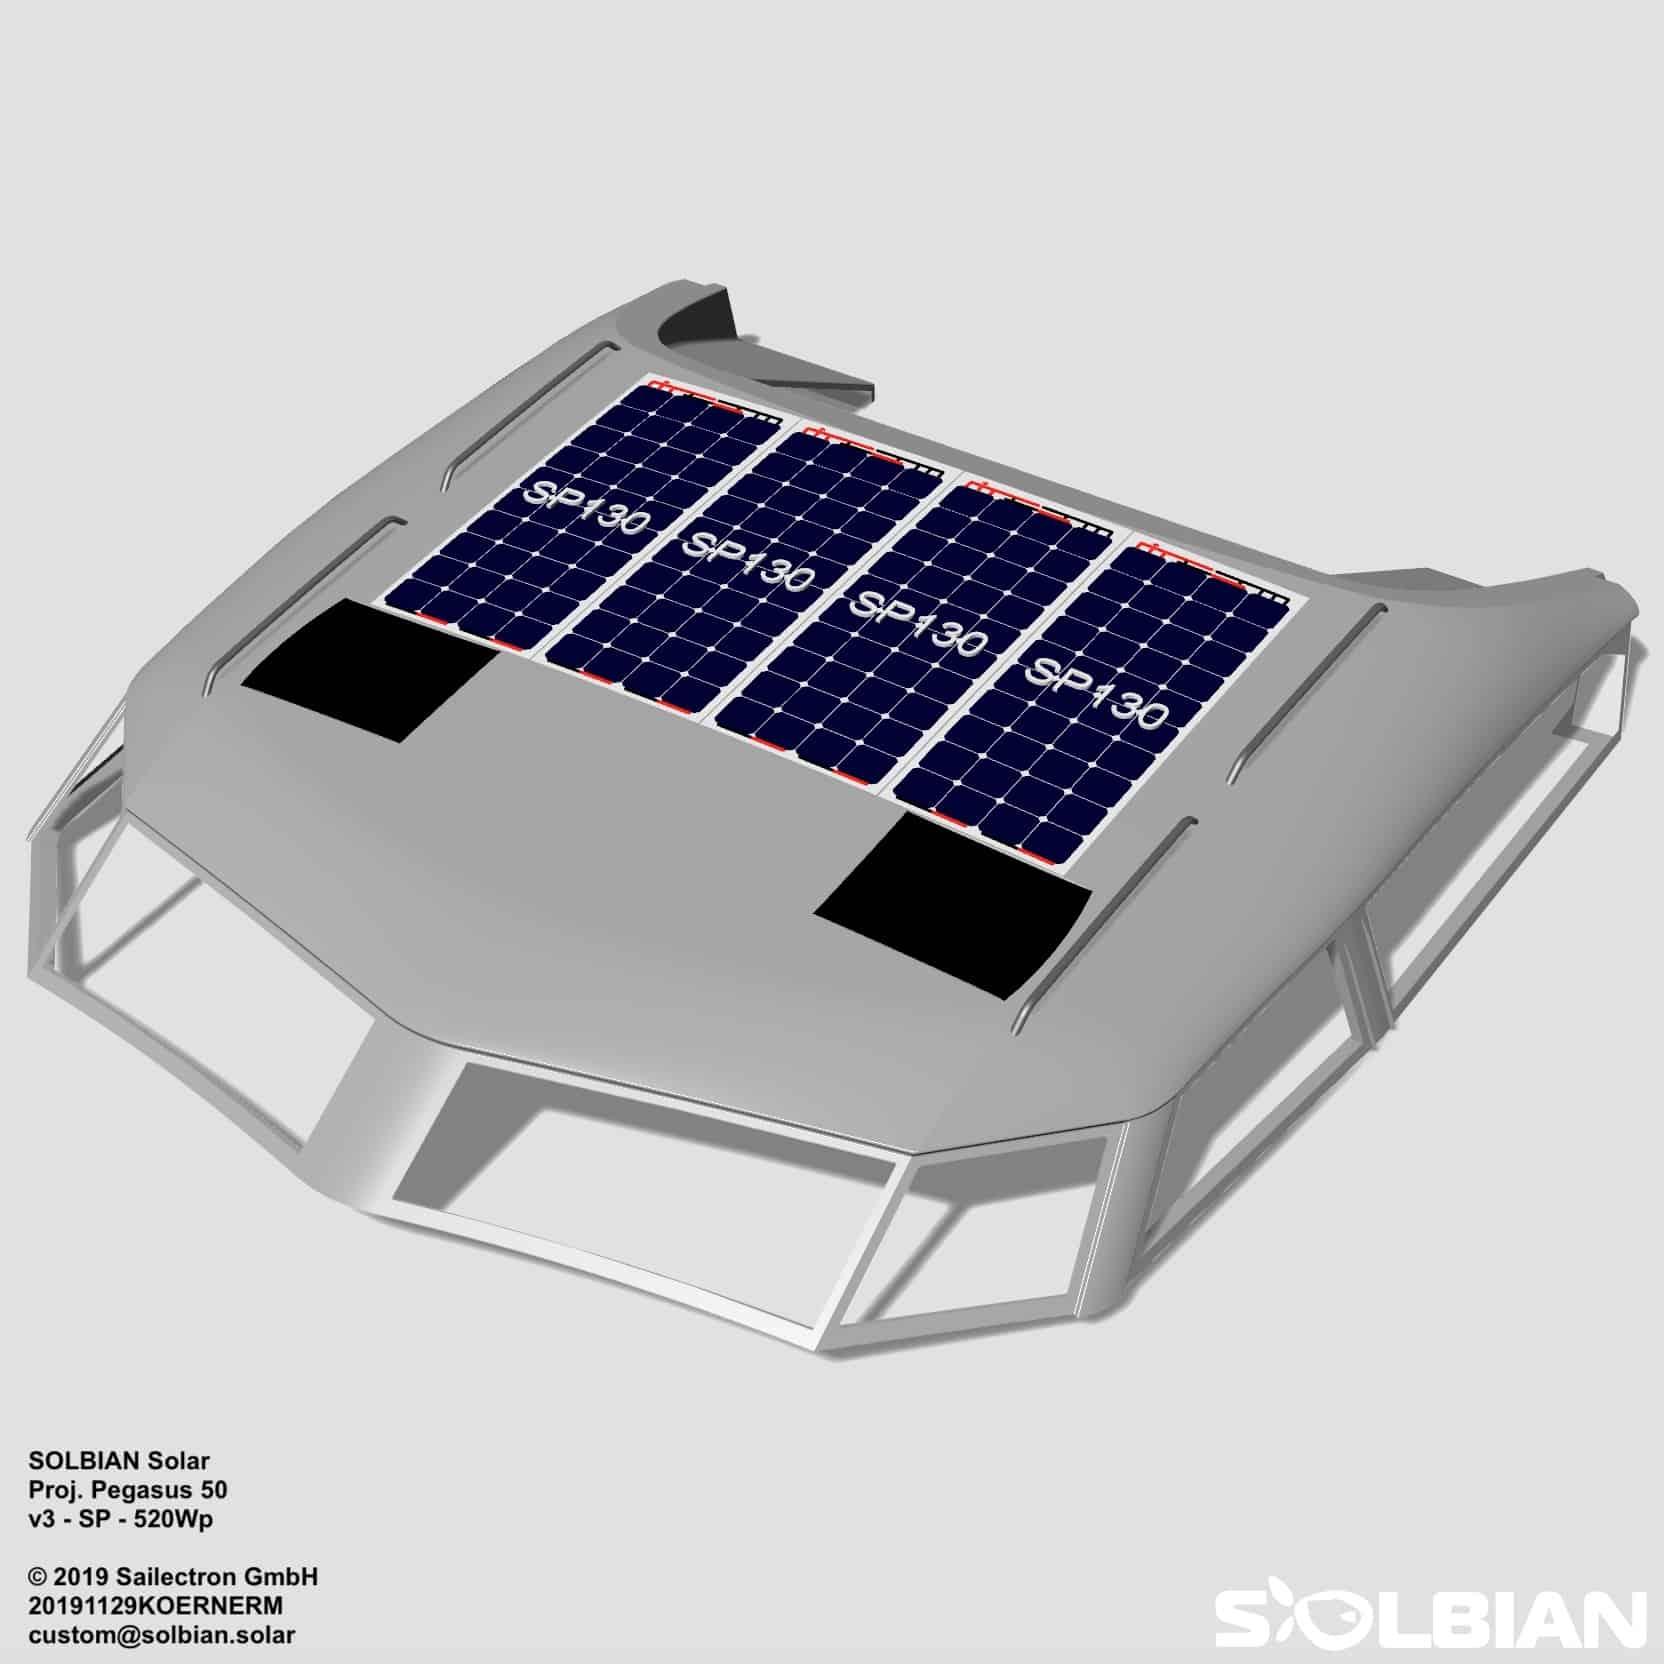 Pegasus 50 Segelyacht Solbian Solar begehbar Solarmodule